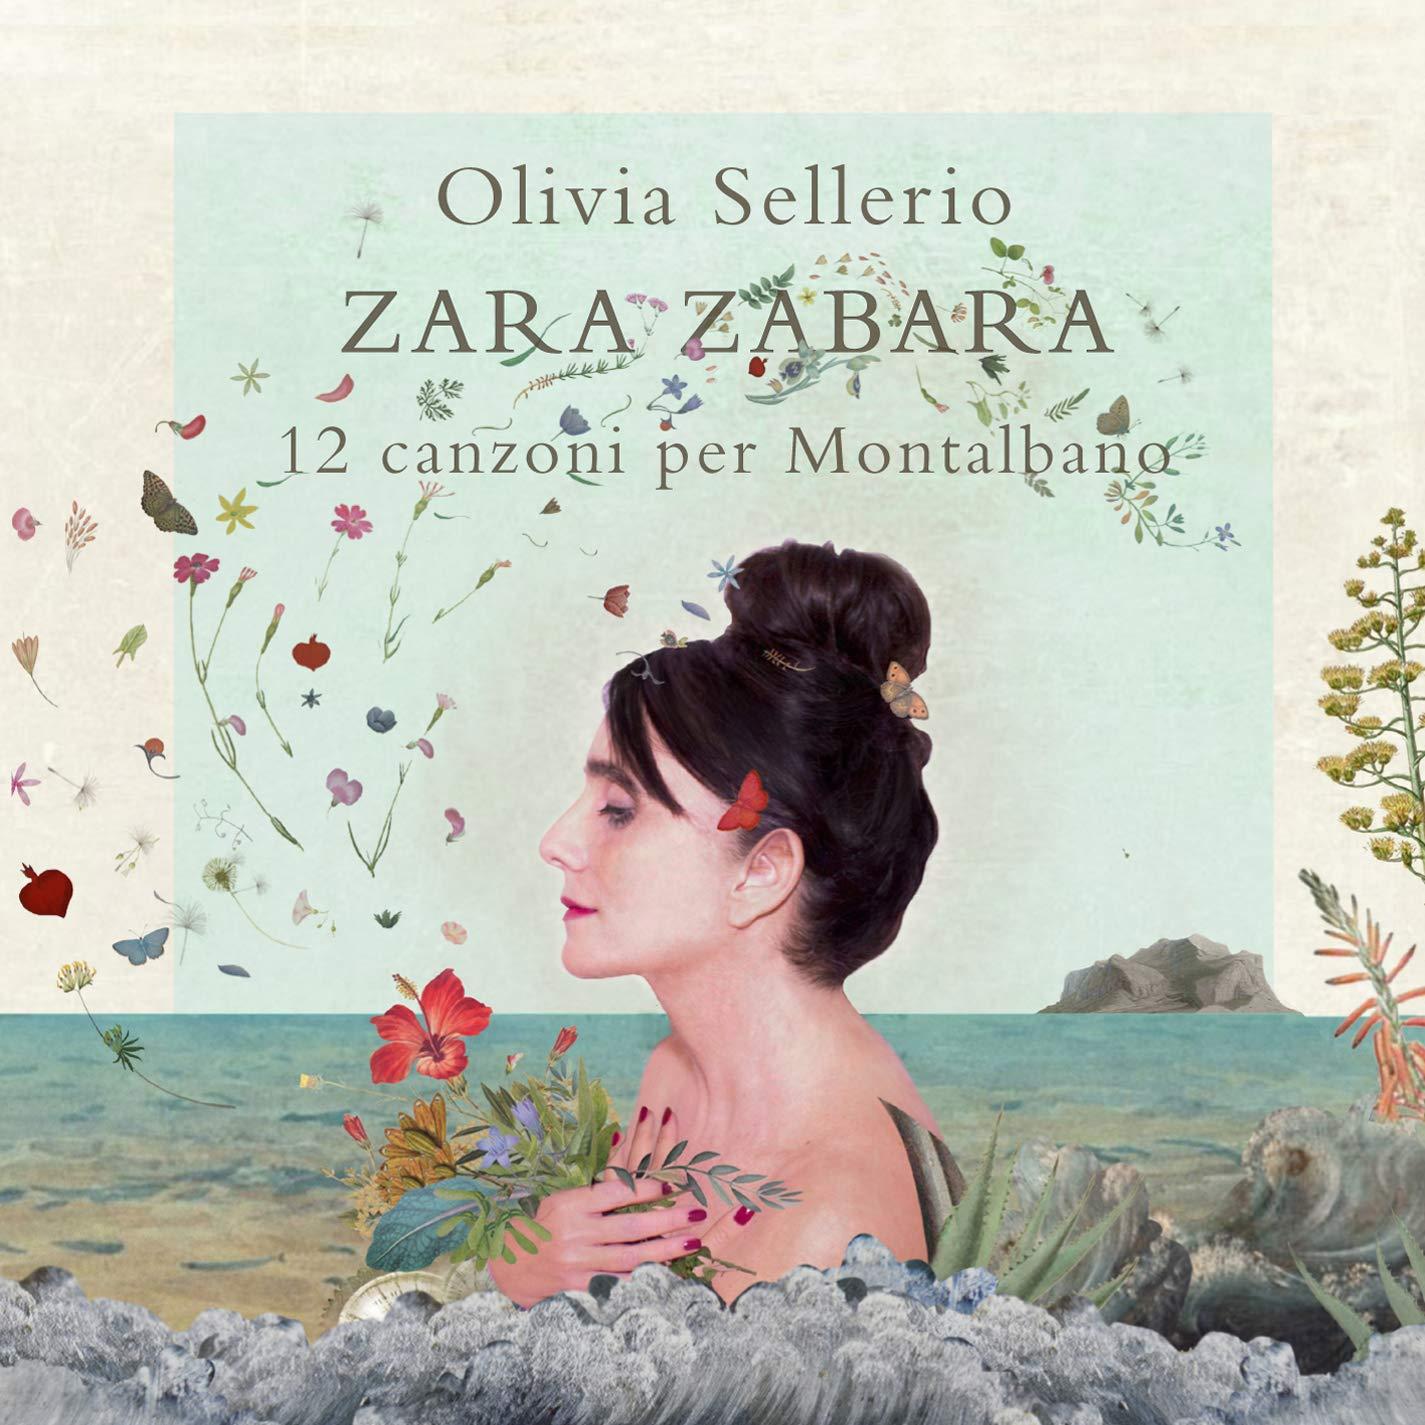 Zara Zabara - 12 Canzoni per Montalbano - Coloured and Numbered Vinyl, 180g [Amazon Exclusive]